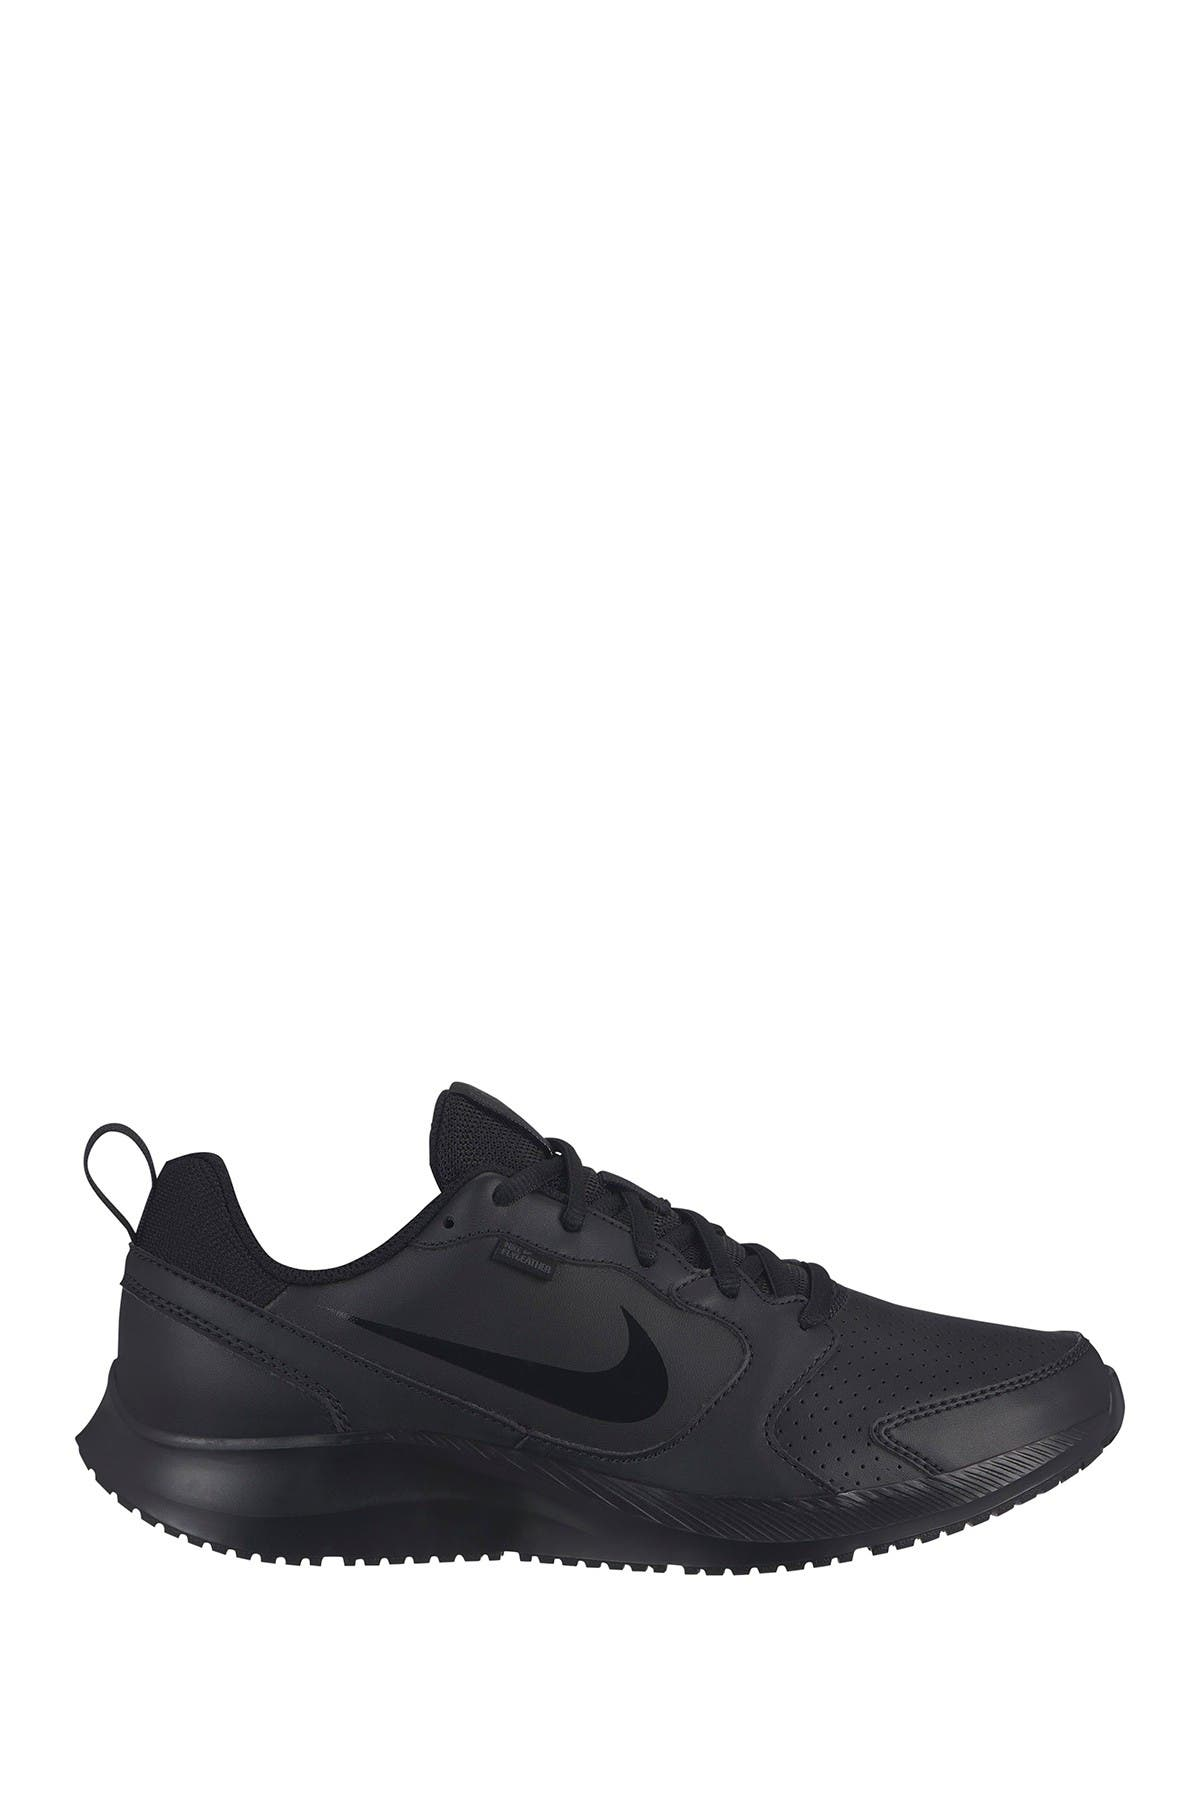 Image of Nike Todos Sneaker